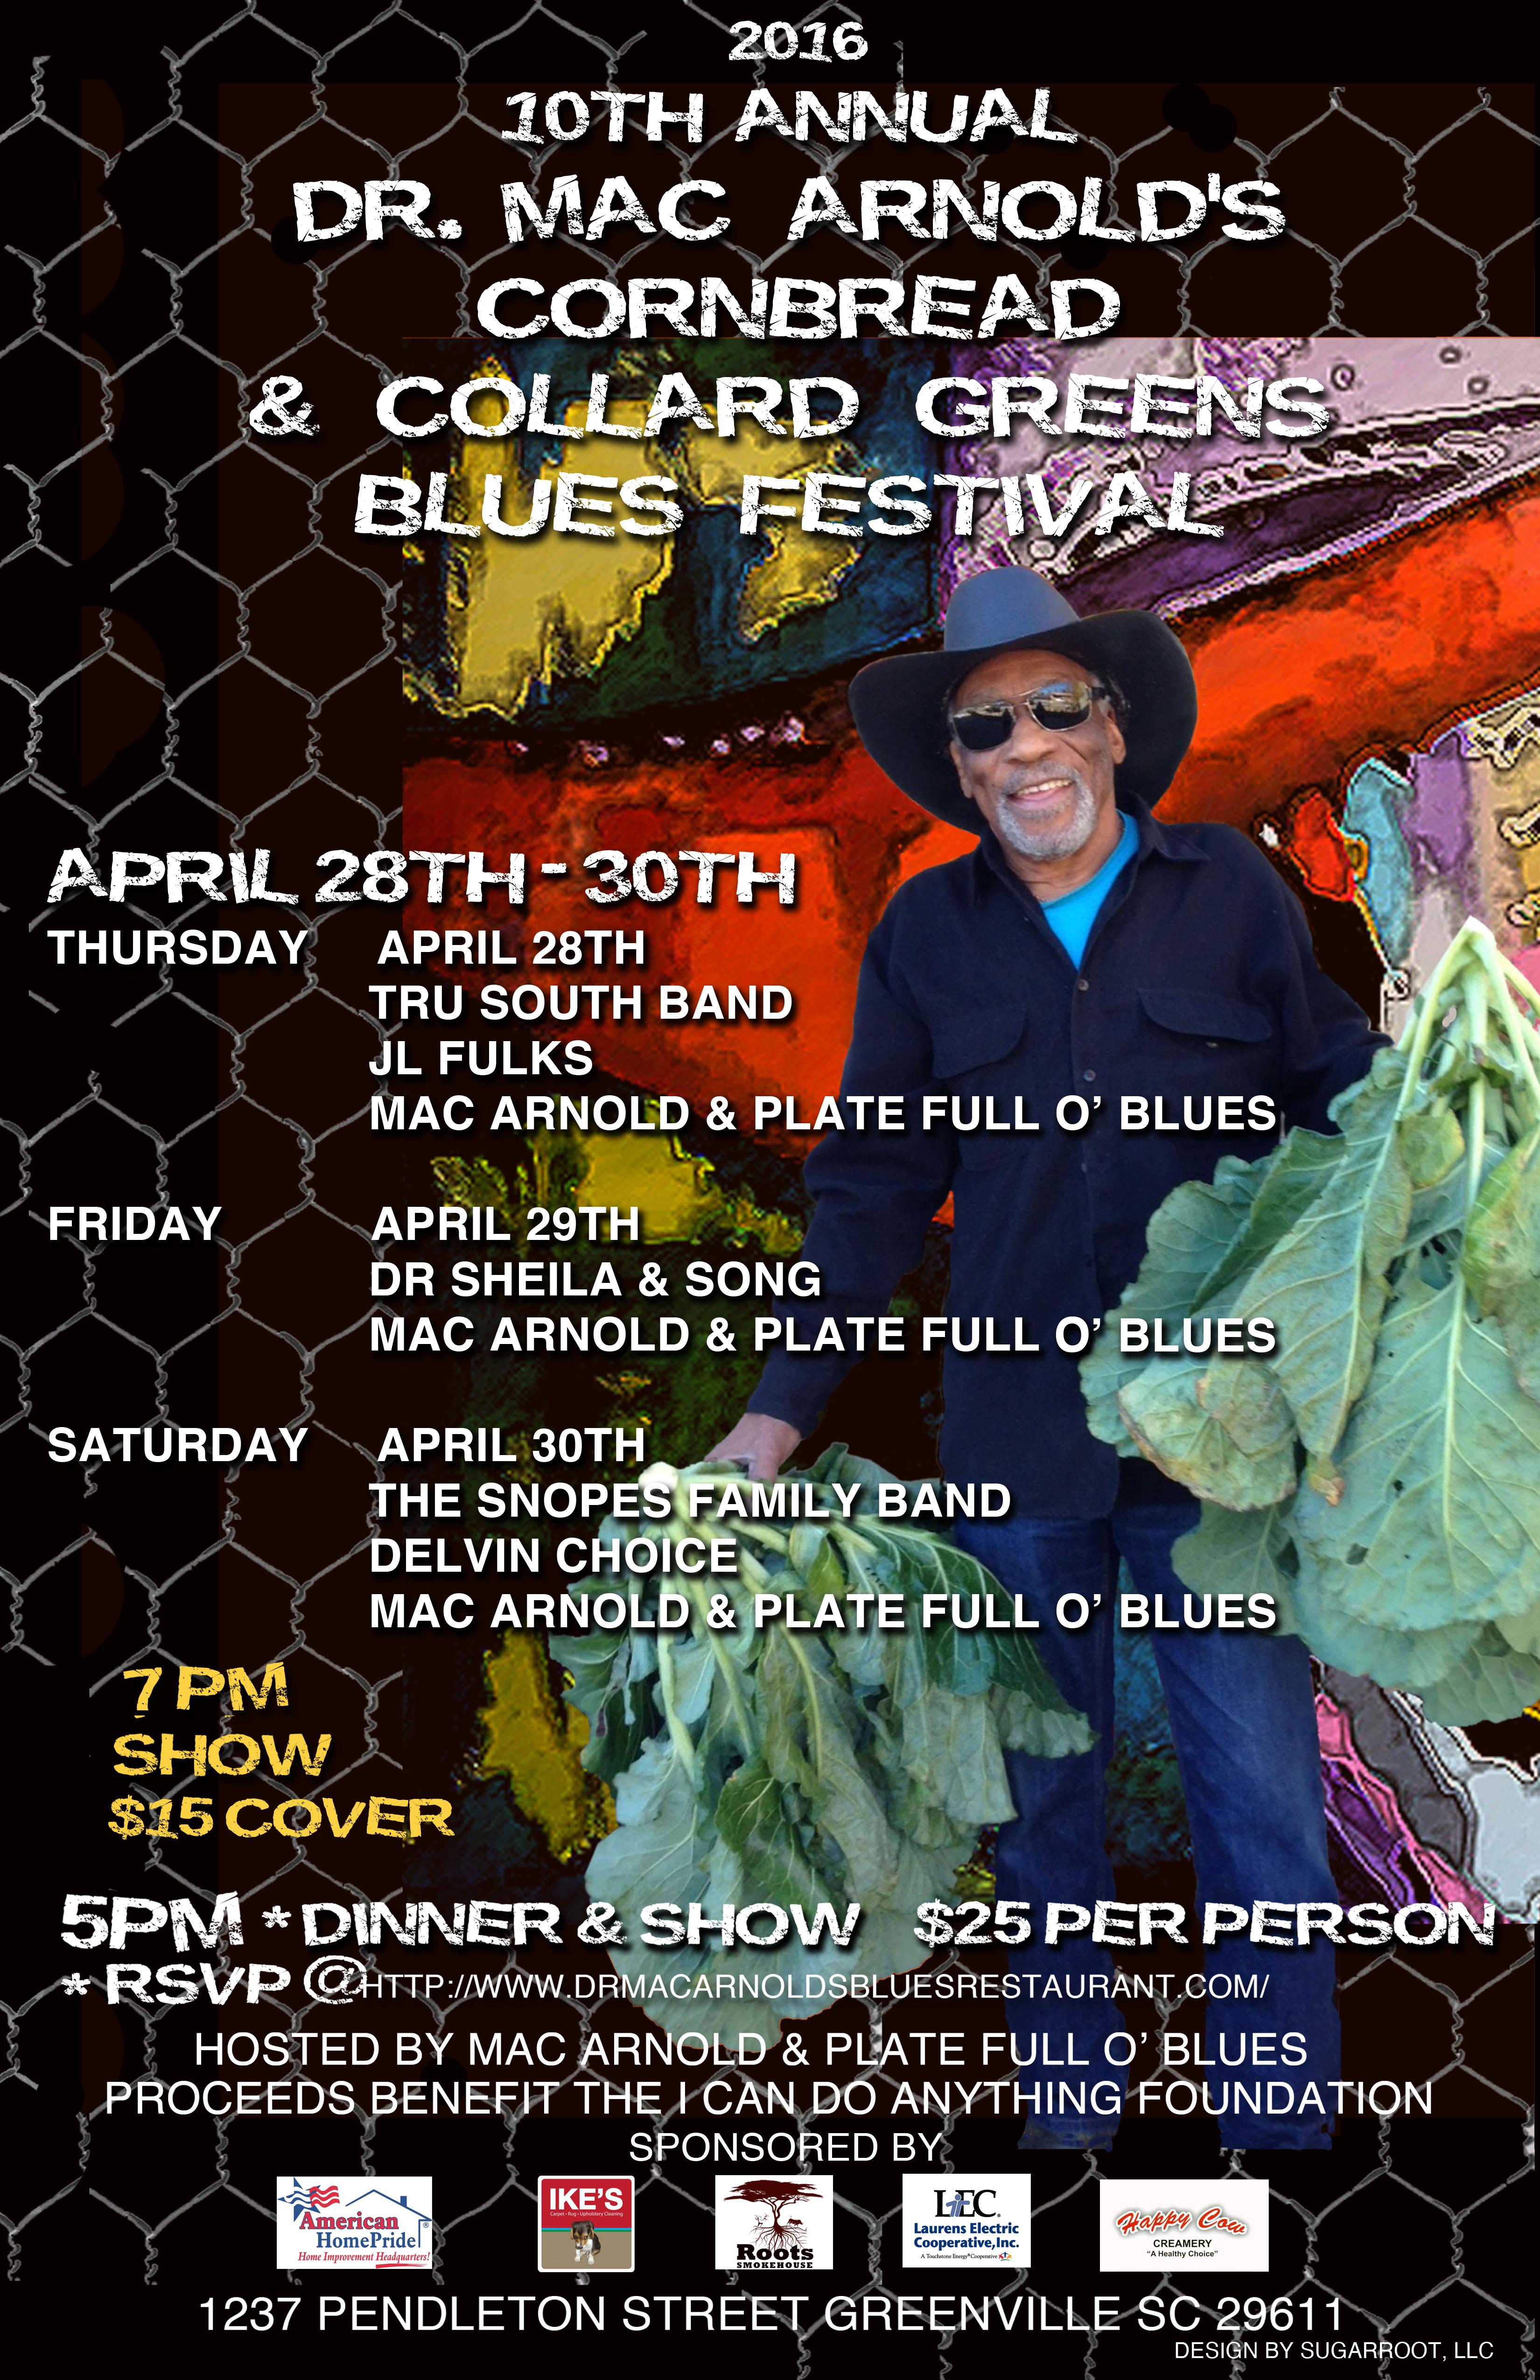 April 2016 - 10th Annual Cornbread & Collard Greens Blues Festival